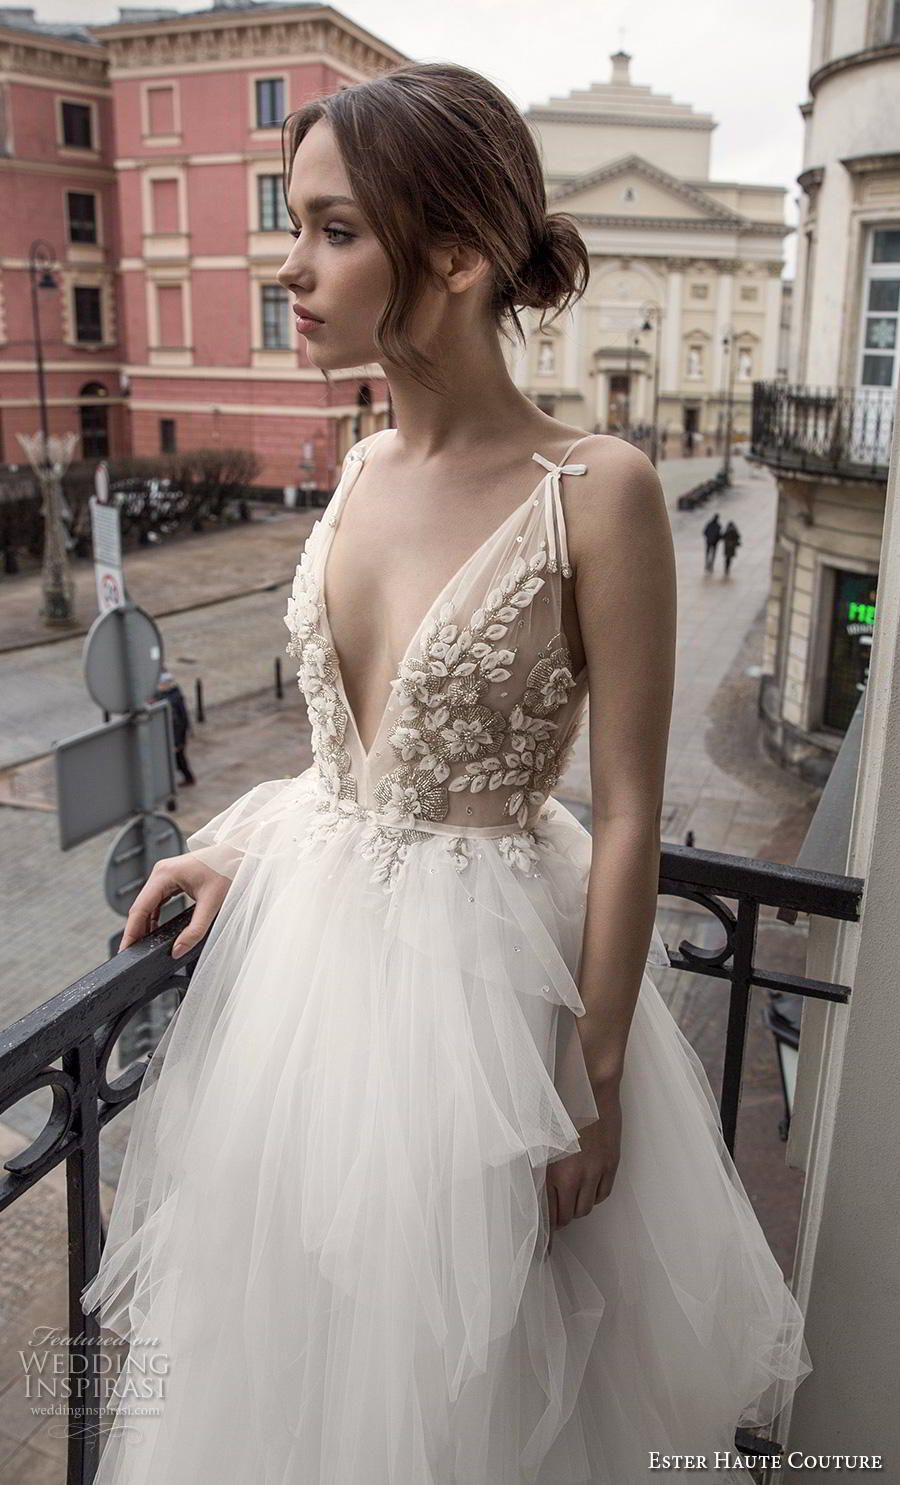 Ester Haute Couture 2018 2019 Wedding Dresses Wedding Inspirasi Wedding Dresses Lace Black Wedding Dresses Wedding Dresses